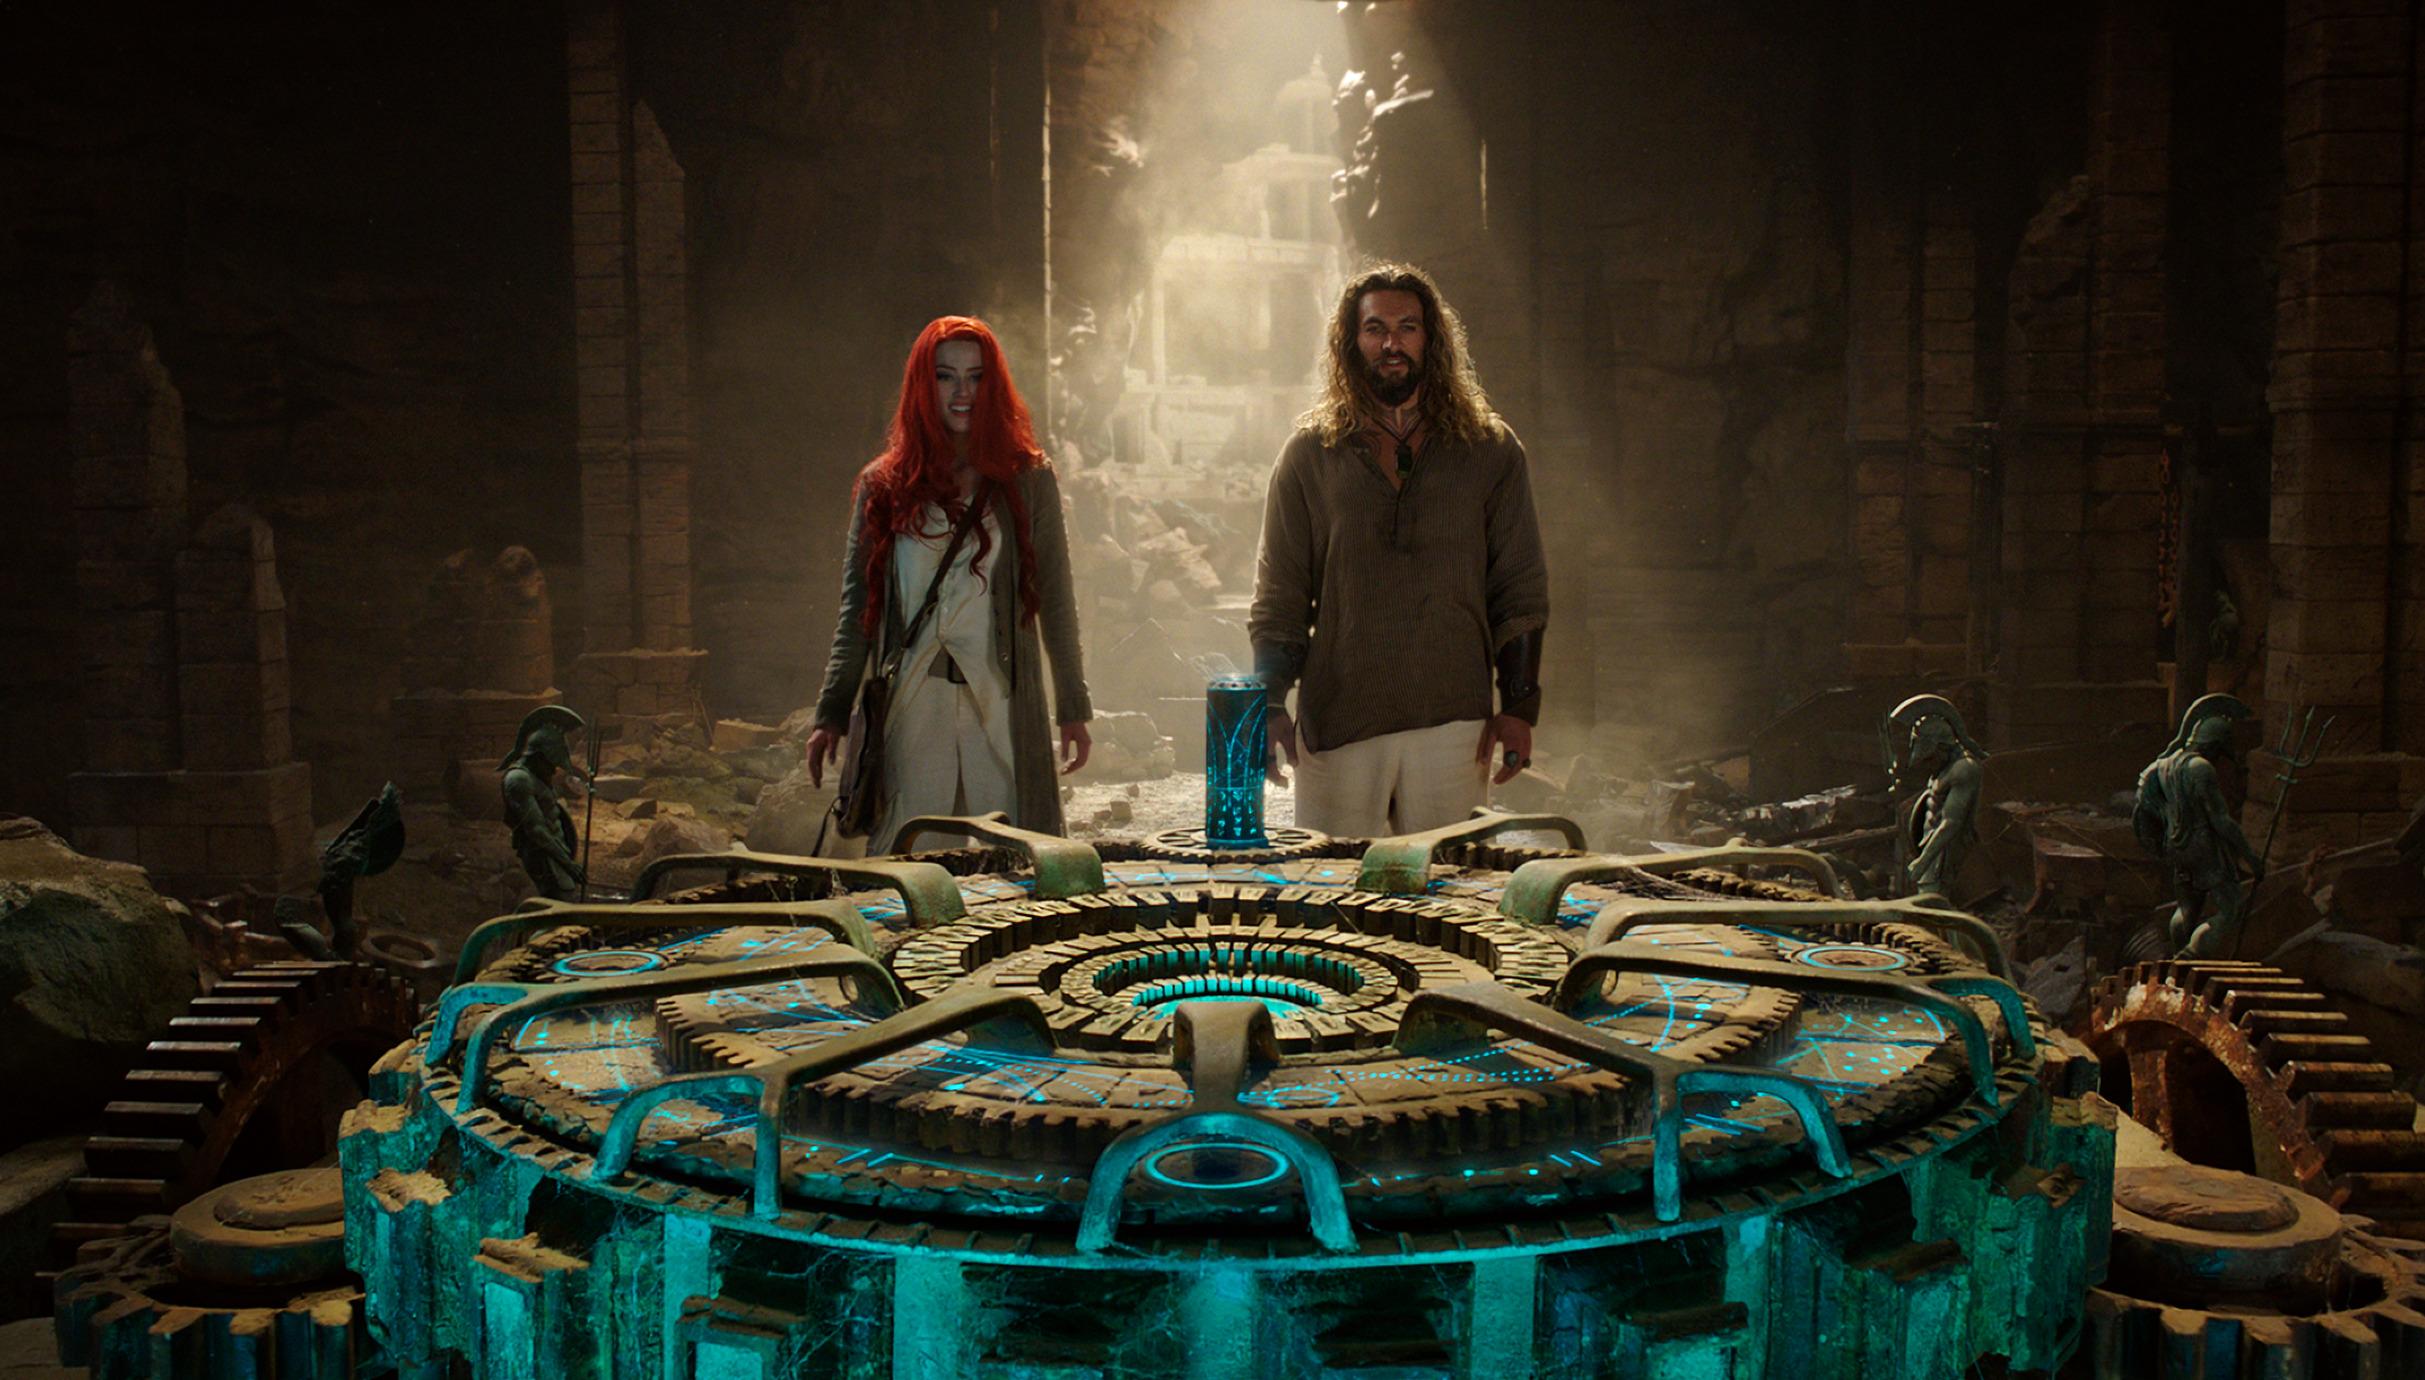 Aquaman 2: Release Date, Cast, & All Fresh News About Aquaman 2 | Trending Update News